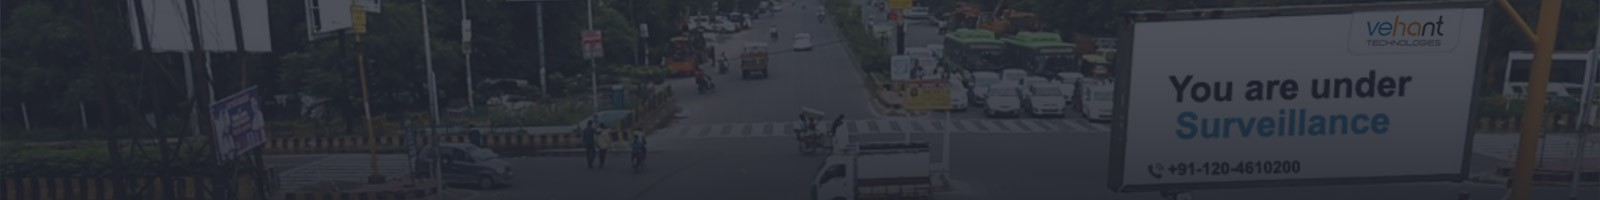 TrafficMon® -  Red Light Violation Detection System